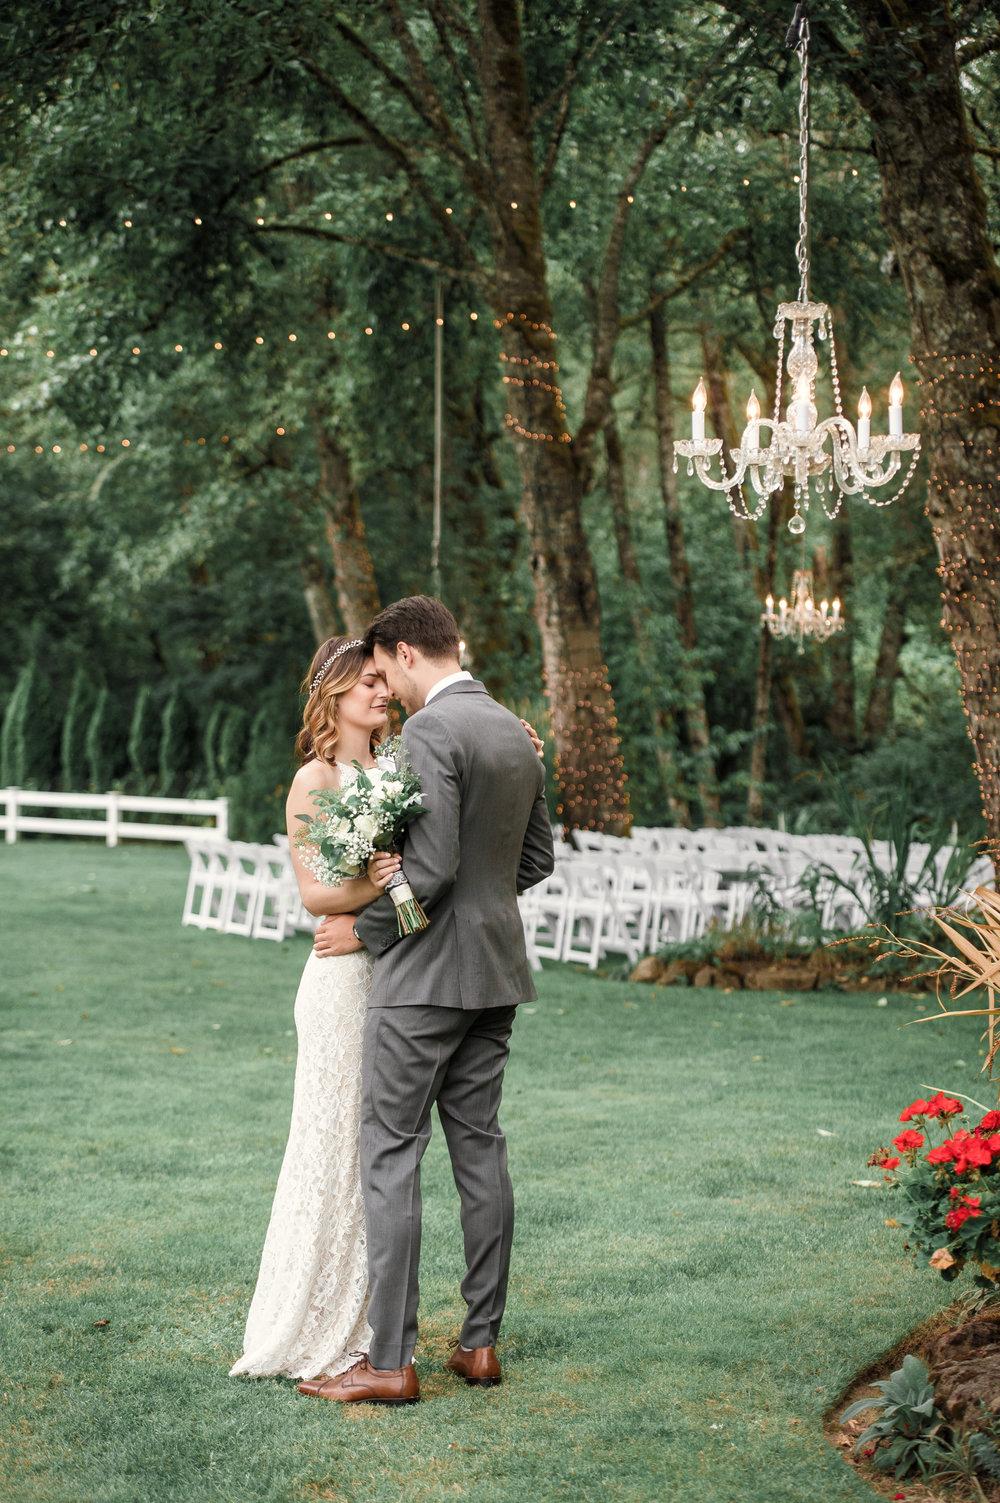 Jennifer Alyse Weddings - Cal & Oksana 024.jpg